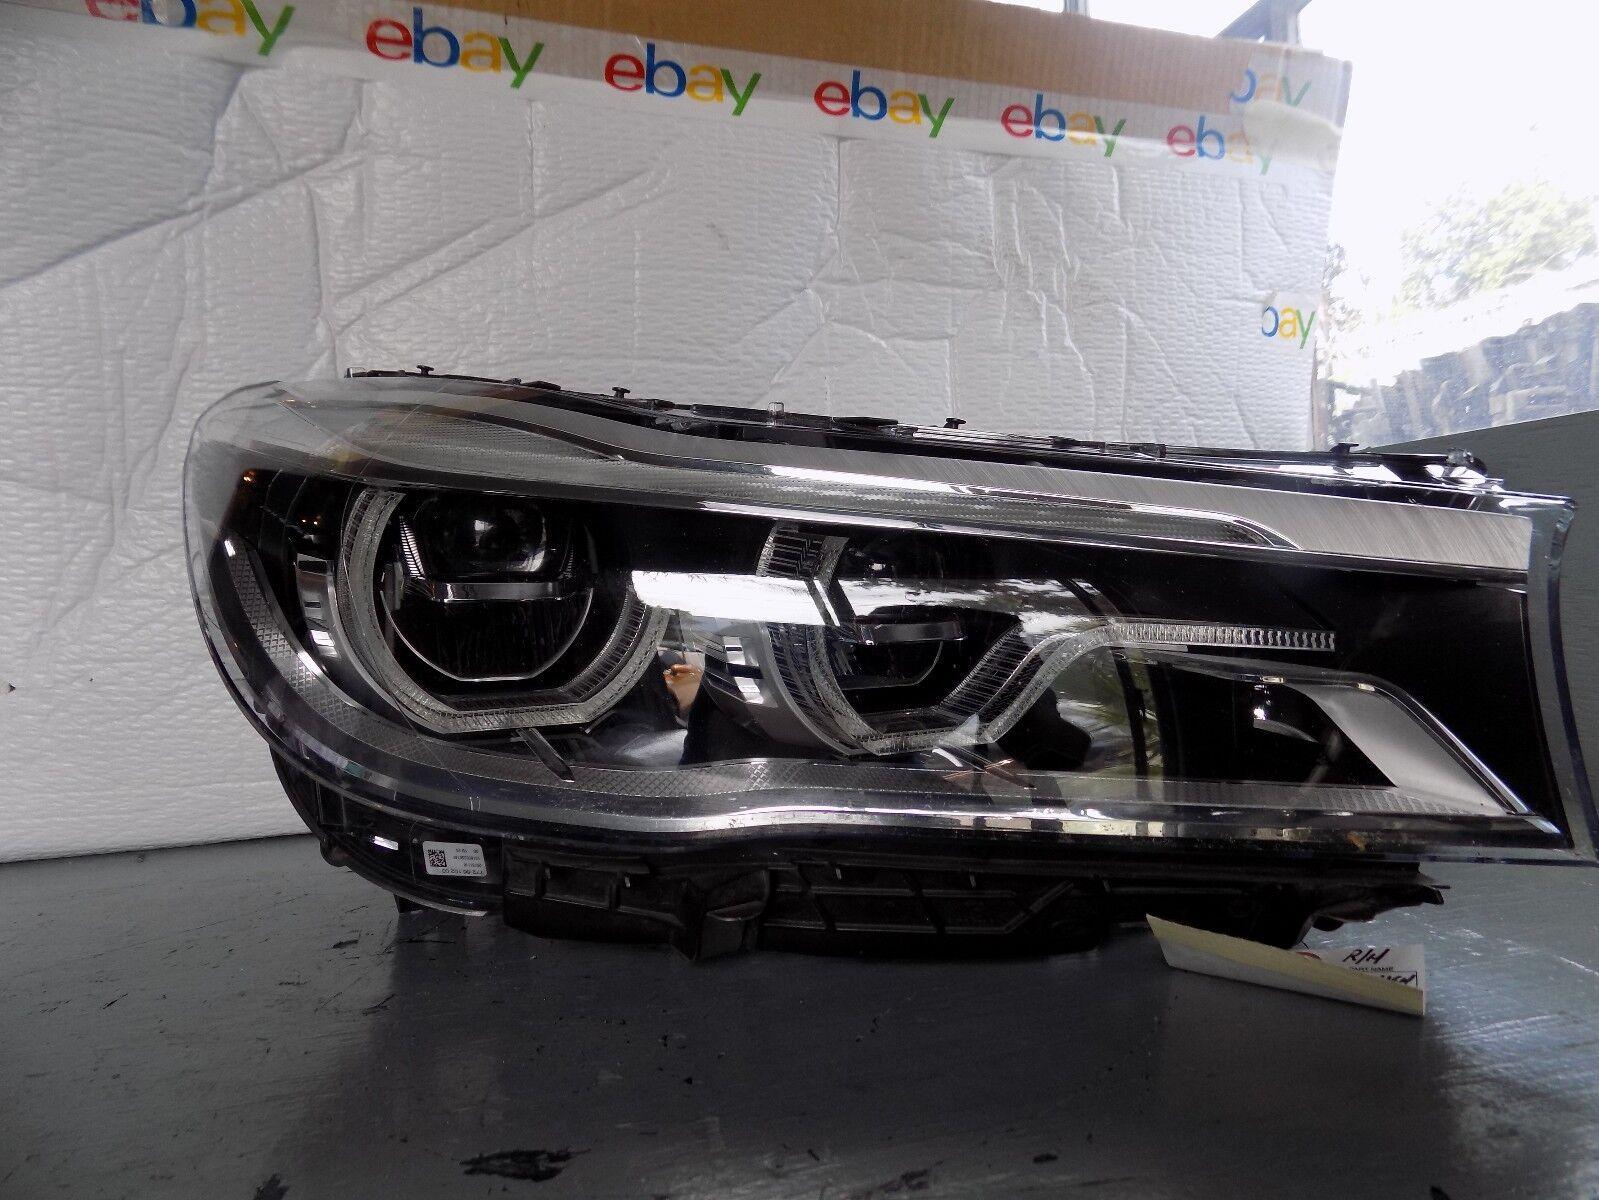 2016 2017 Bmw 7 Series Right Side Headlight Full Led Adaptive Oem For Sale Online Ebay